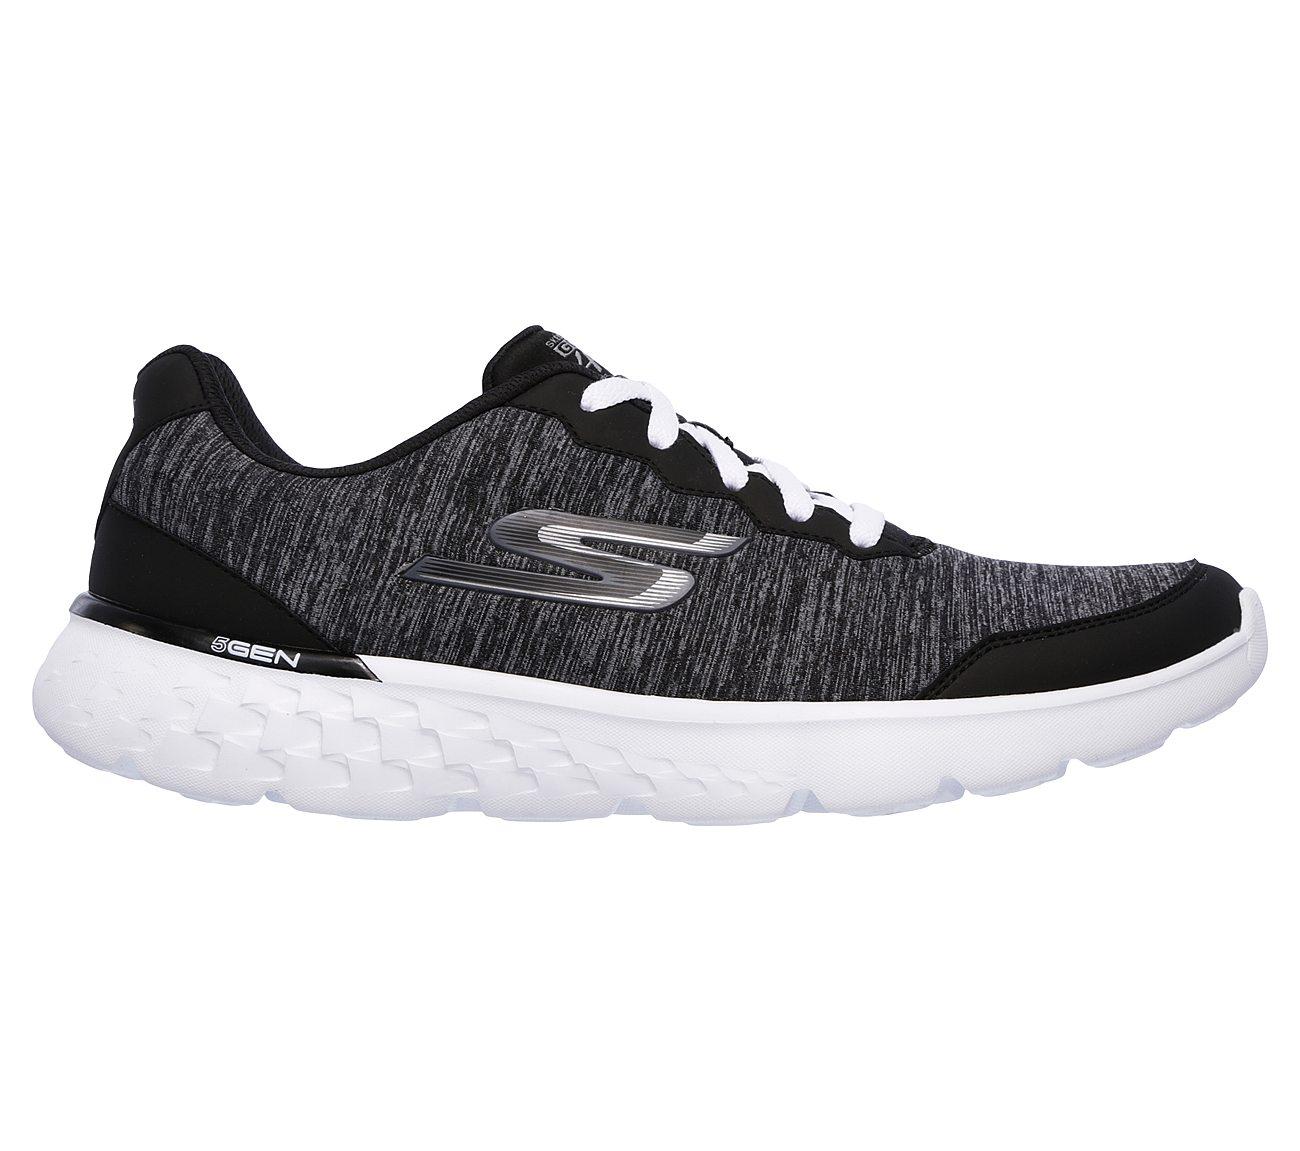 Skechers GOrun 400 BKW14354 Womens Performance Shoes Black/White